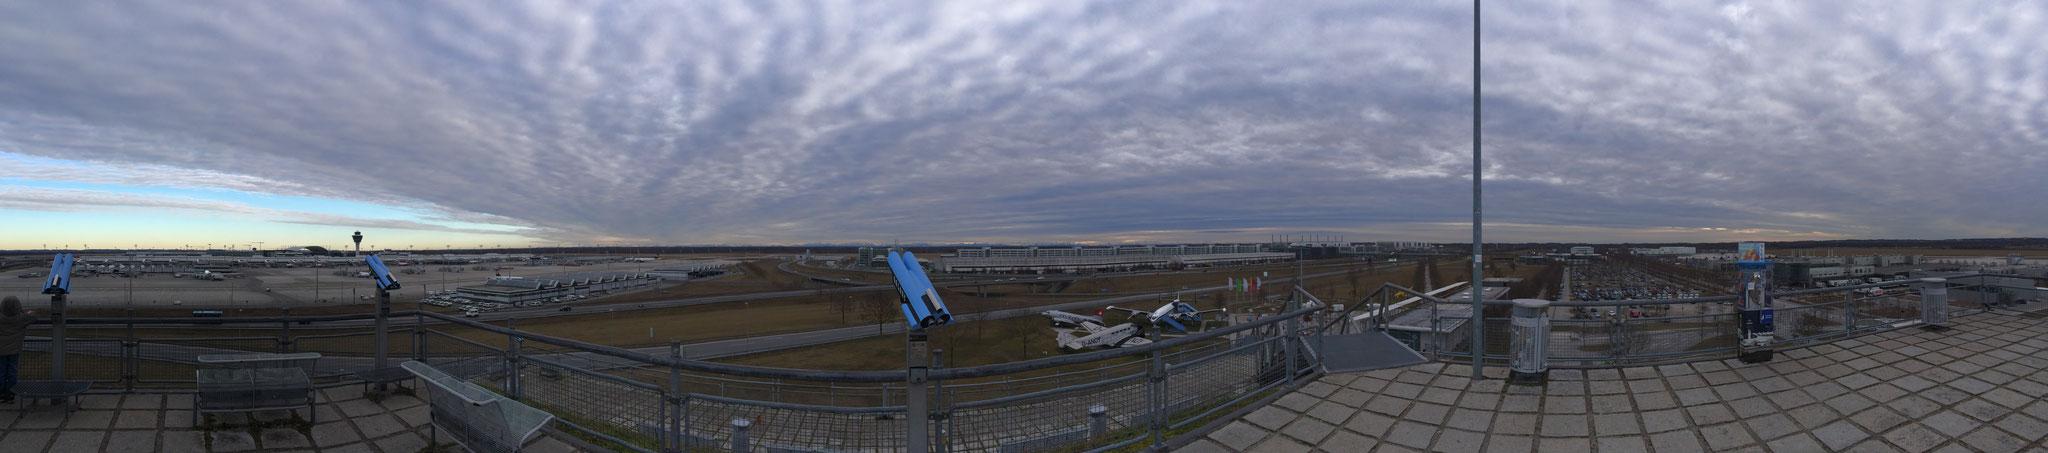 Visitor Platform Airport Munich, Germany (2014)